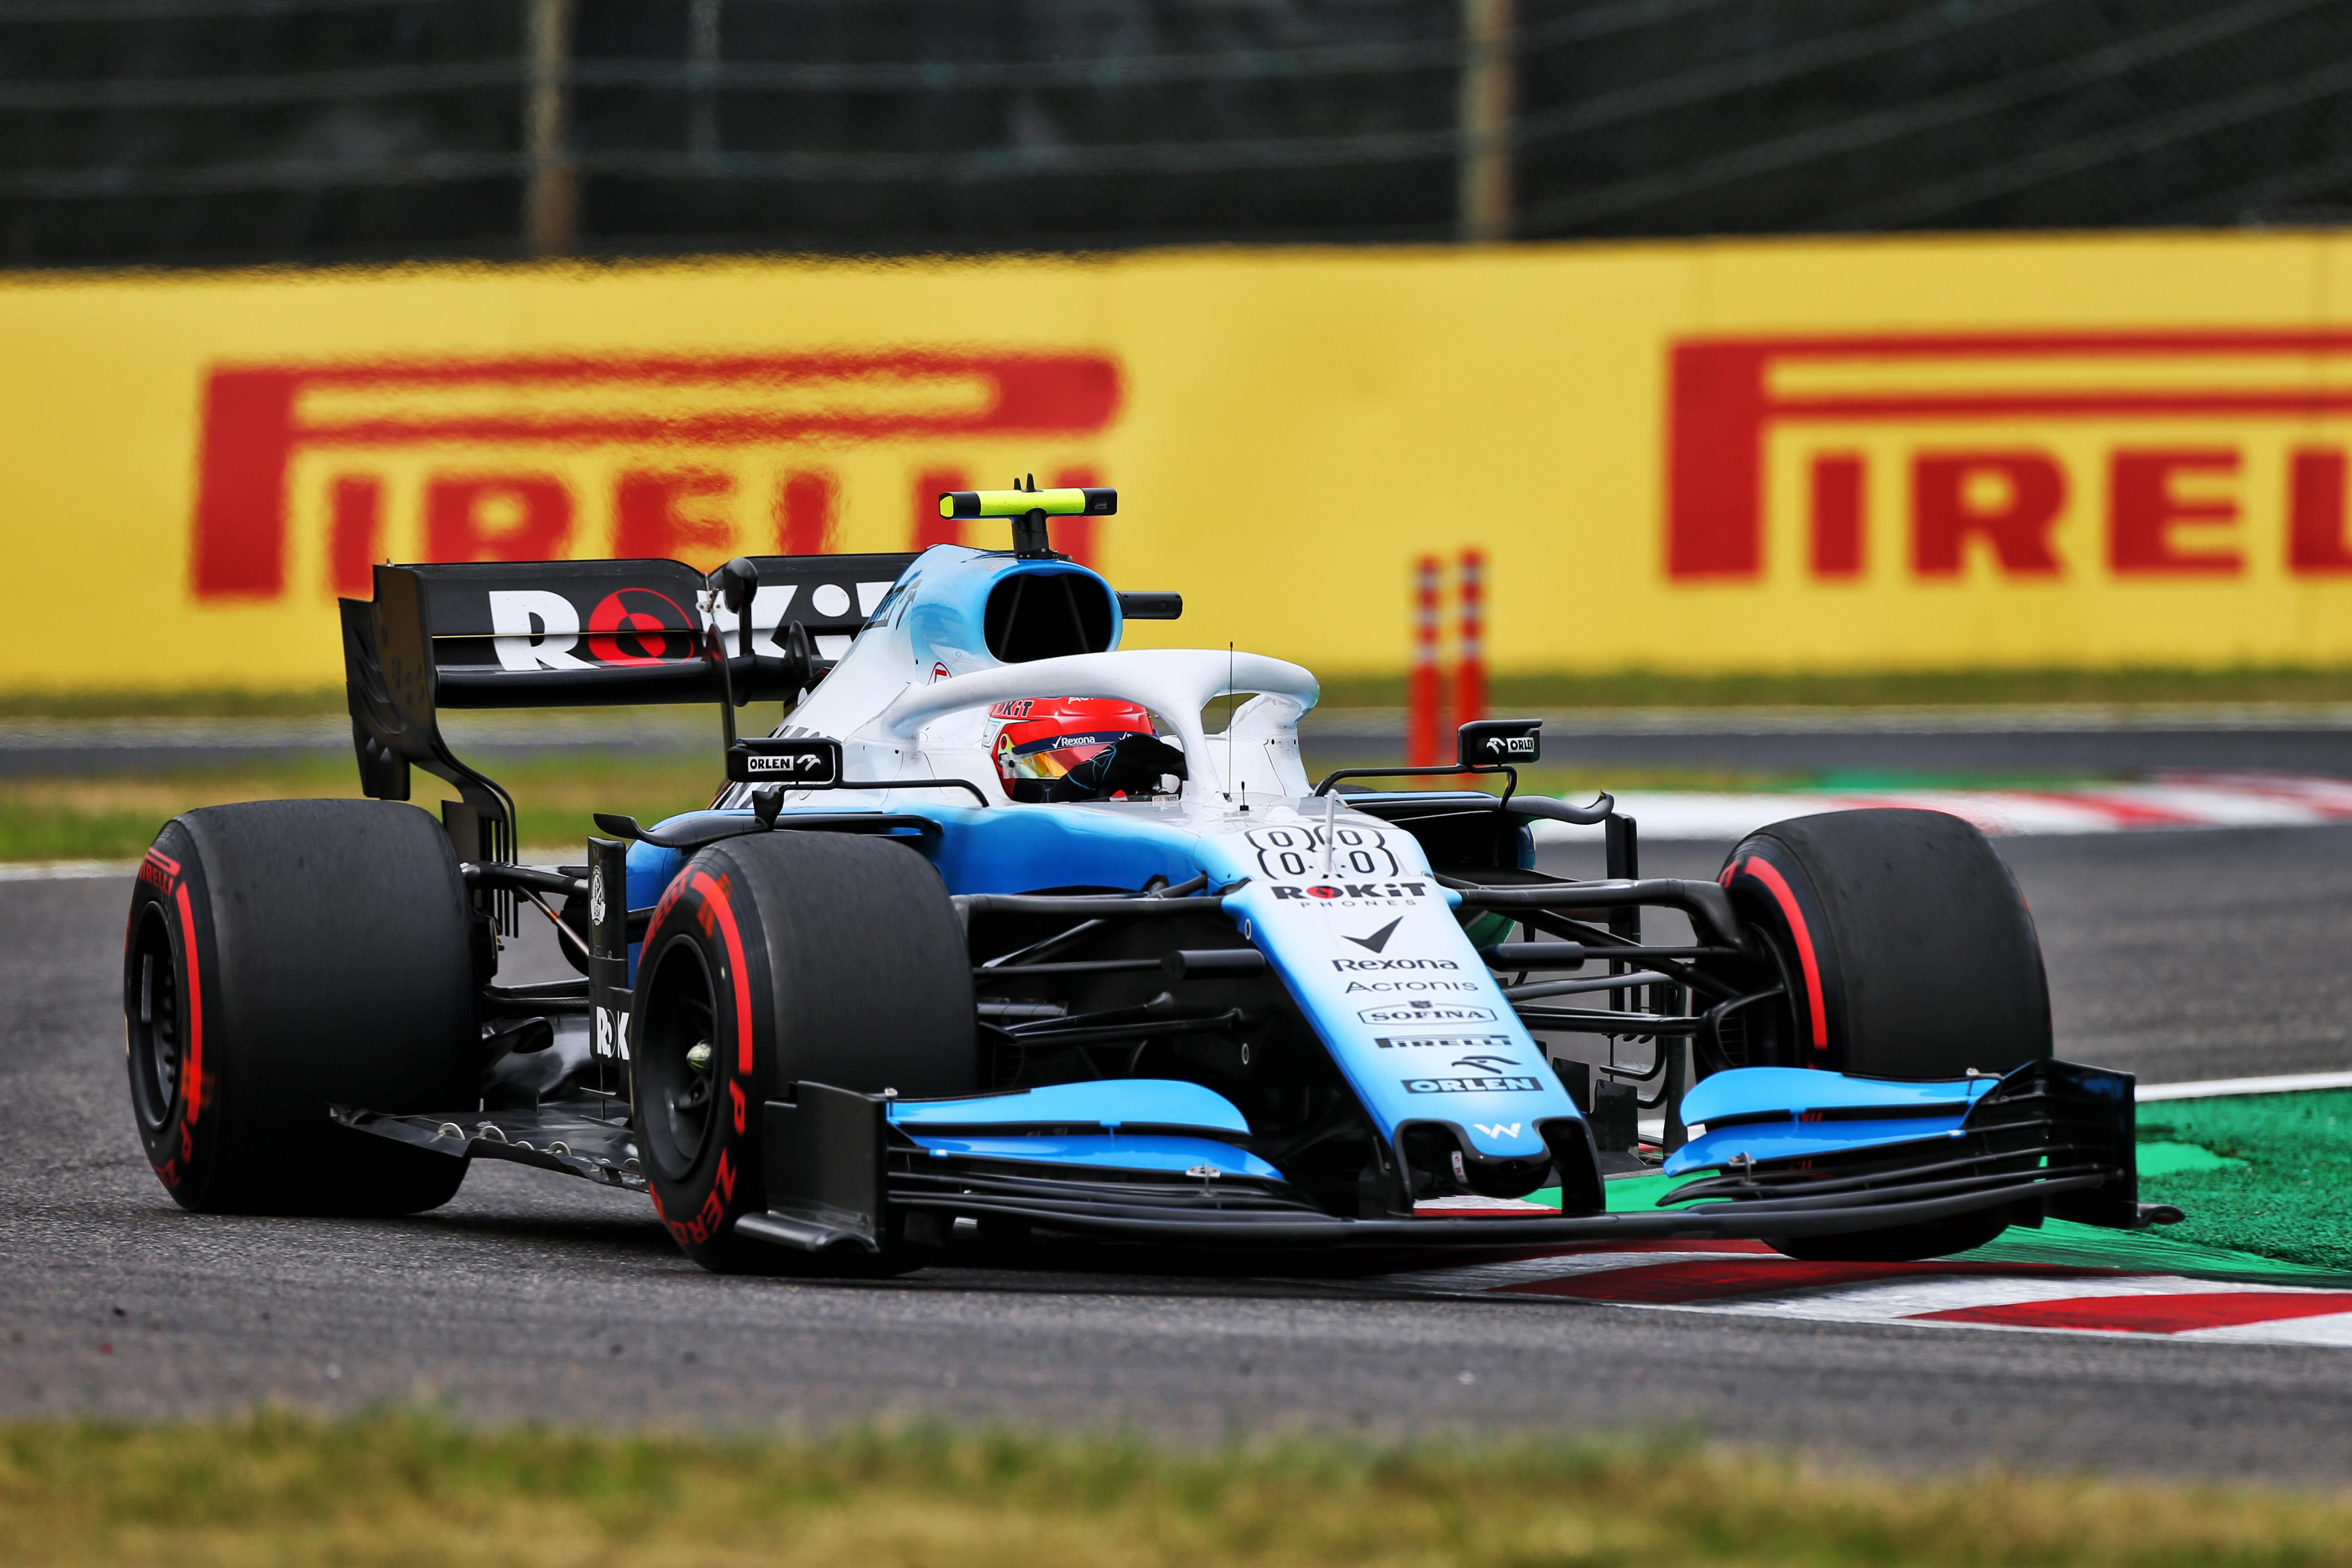 Motor Racing Formula One World Championship Japanese Grand Prix Practice Day Suzuka, Japan